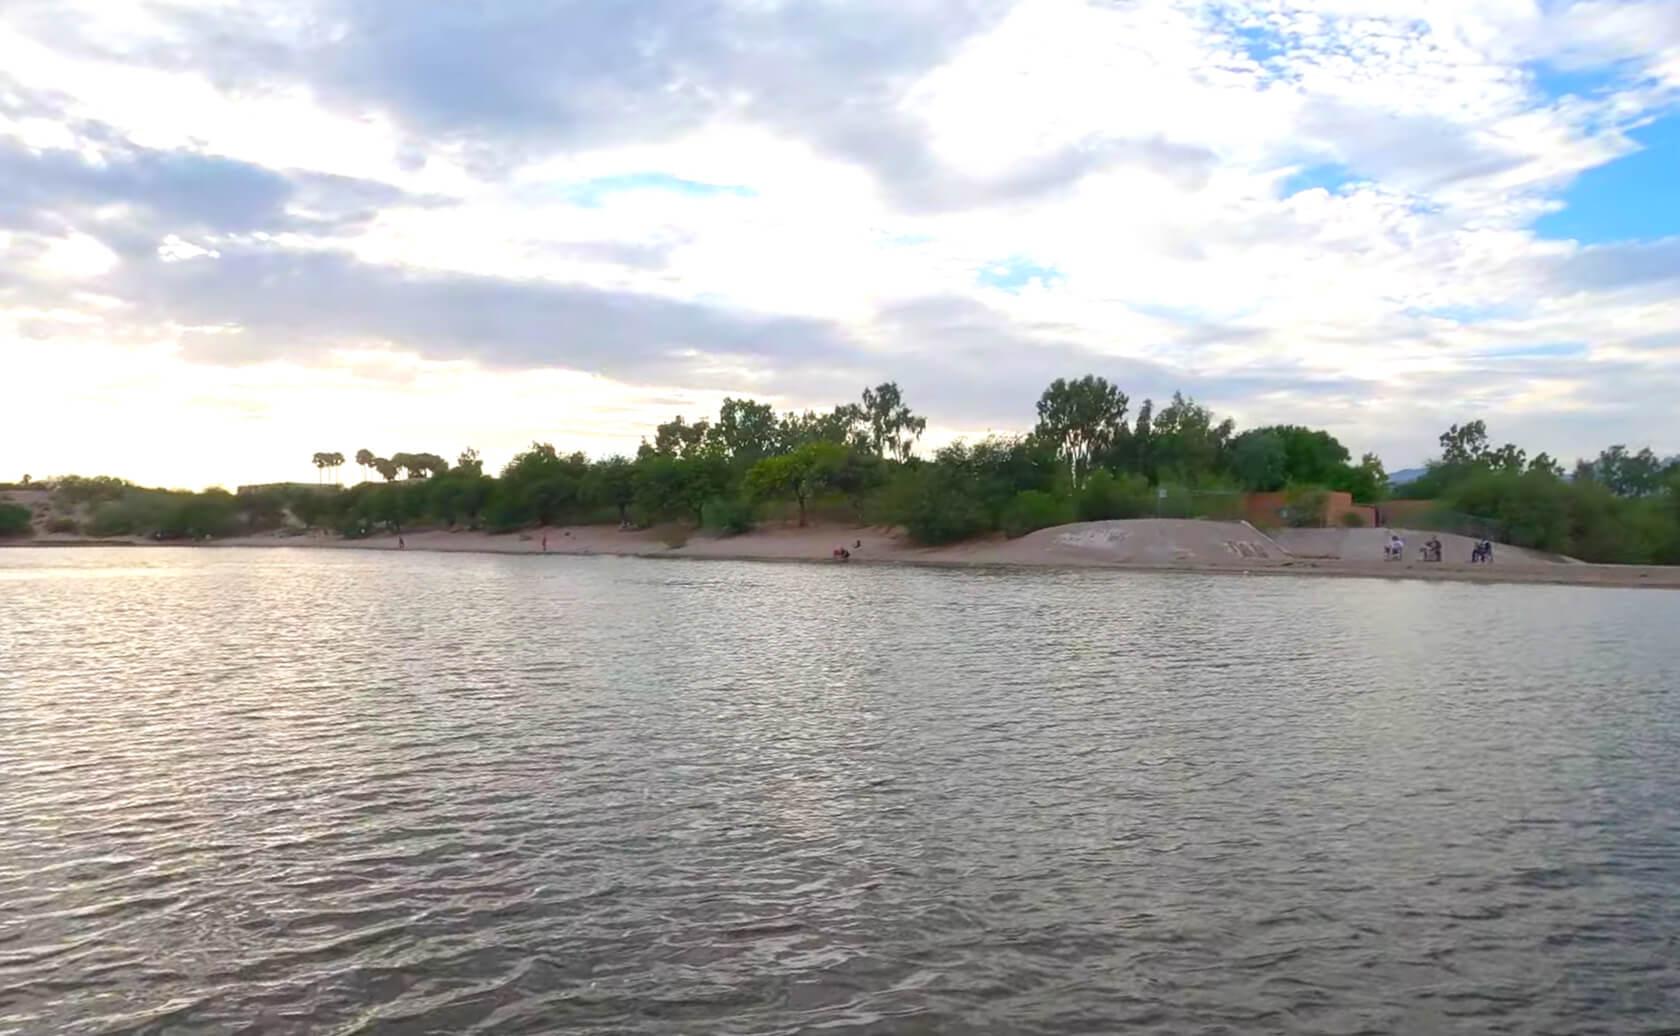 Lakeside-Lake-Fishing-Guide-Tucson-AZ-03